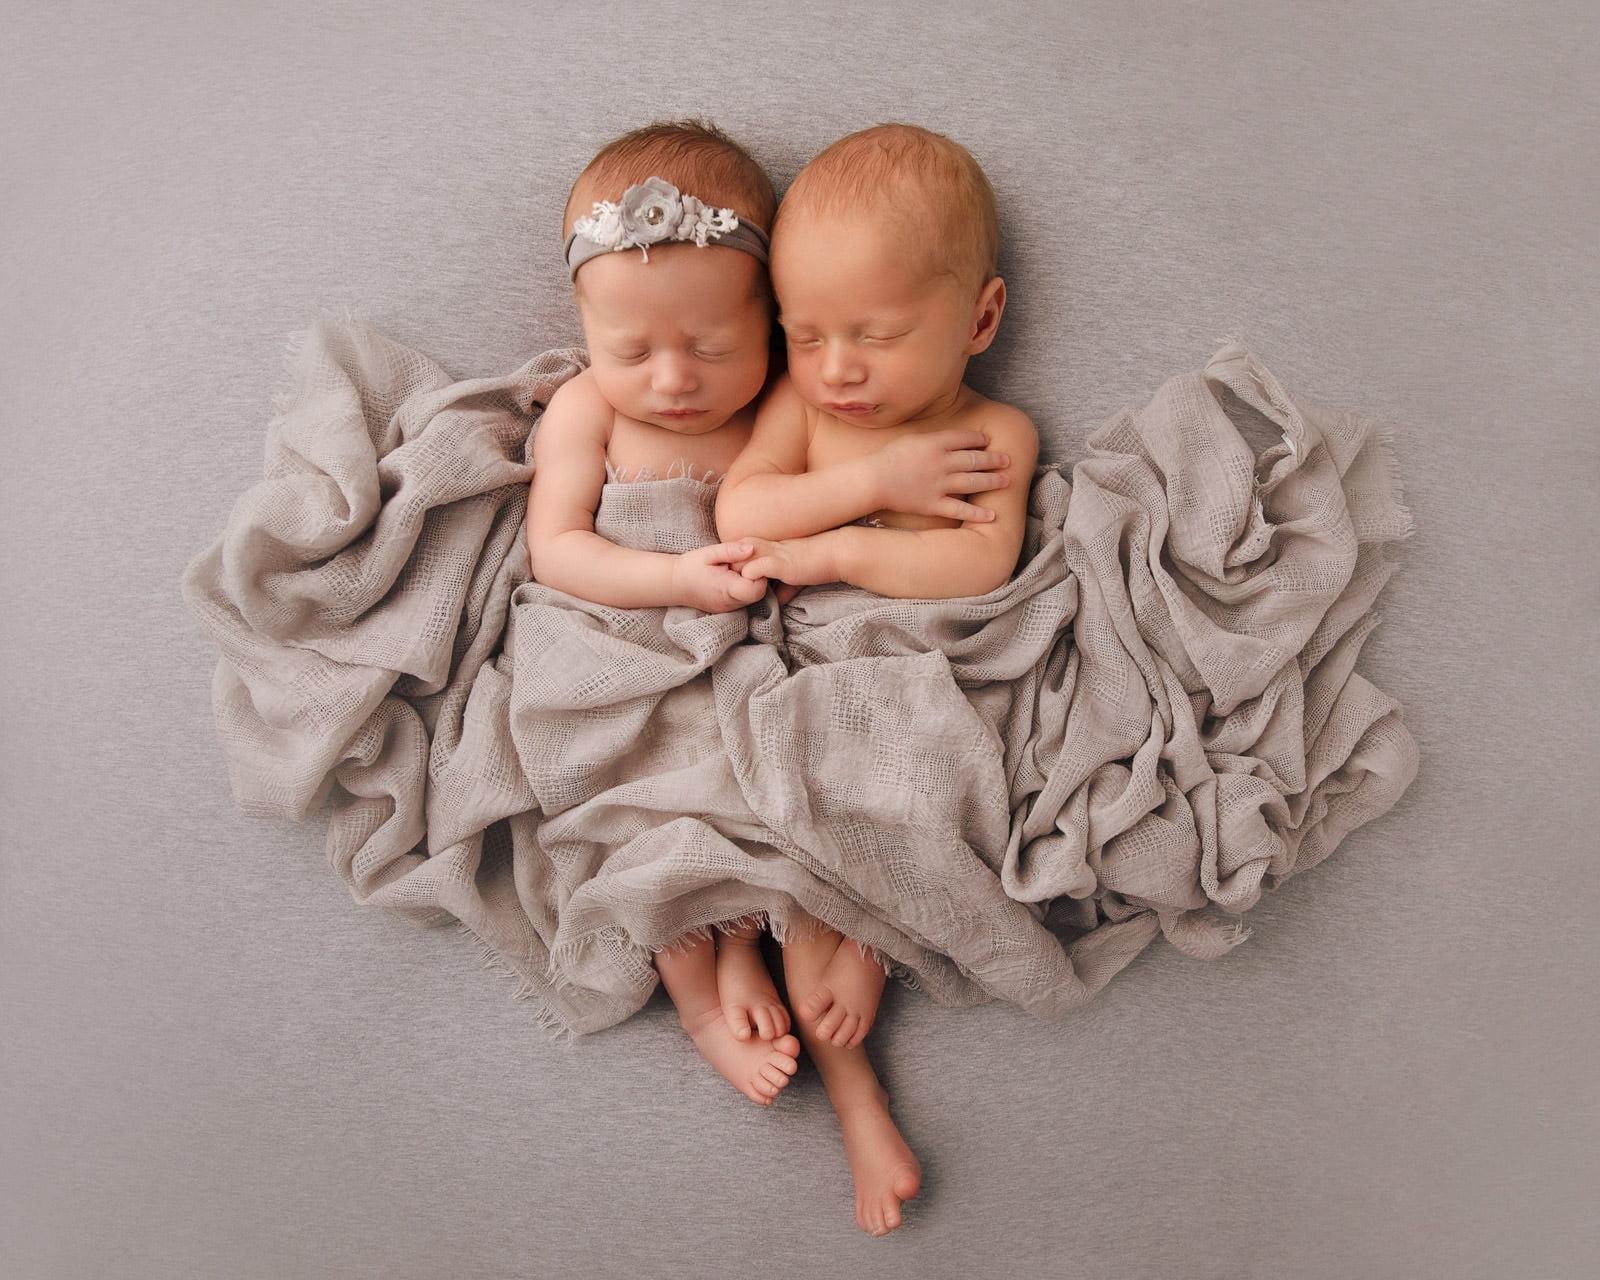 Adorable Newborn Rainbow Twins 8